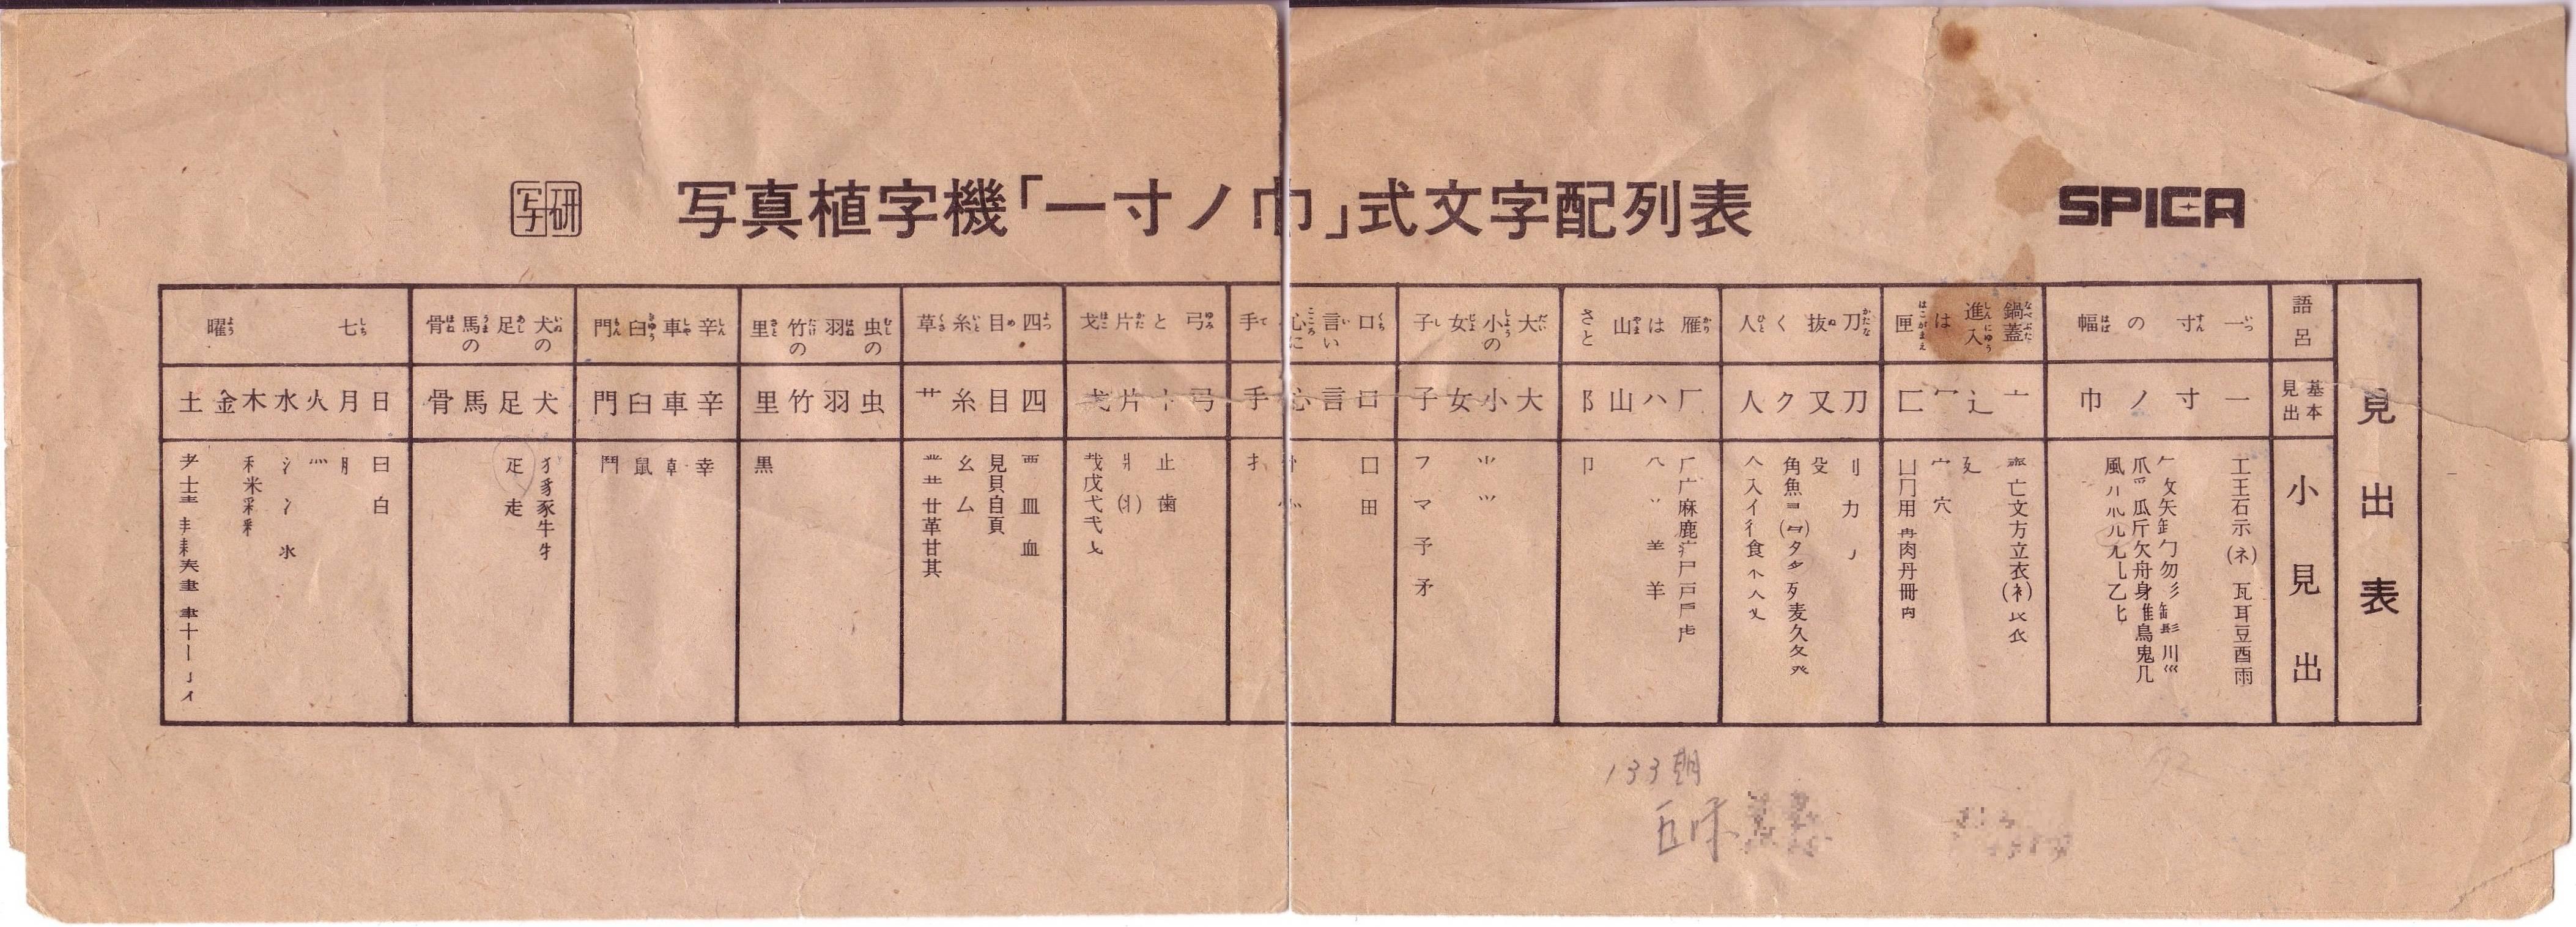 SPICA文字配列表3.JPG